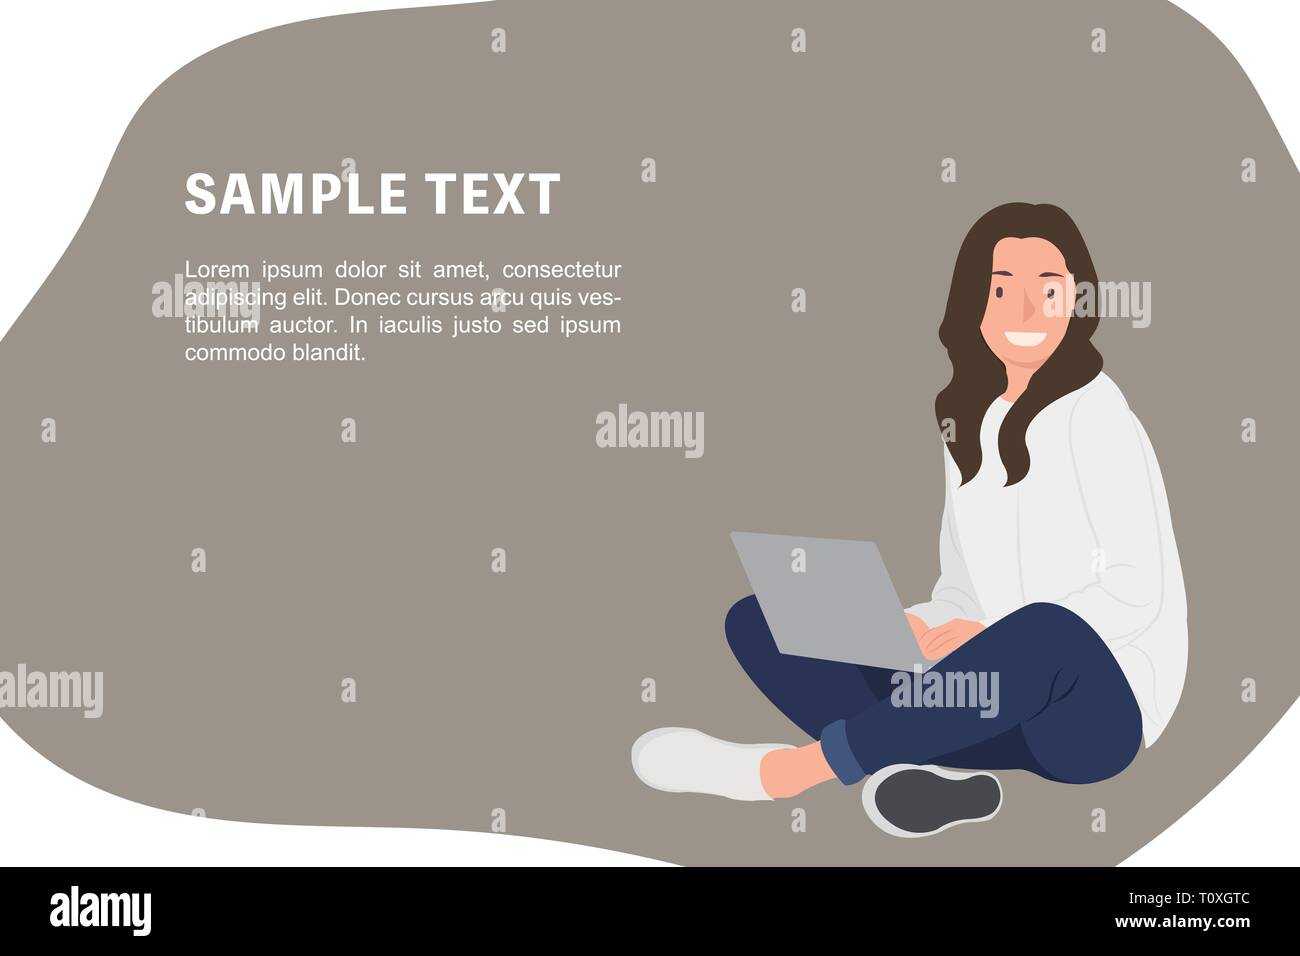 Desi Girl Stock Photos & Desi Girl Stock Images - Alamy